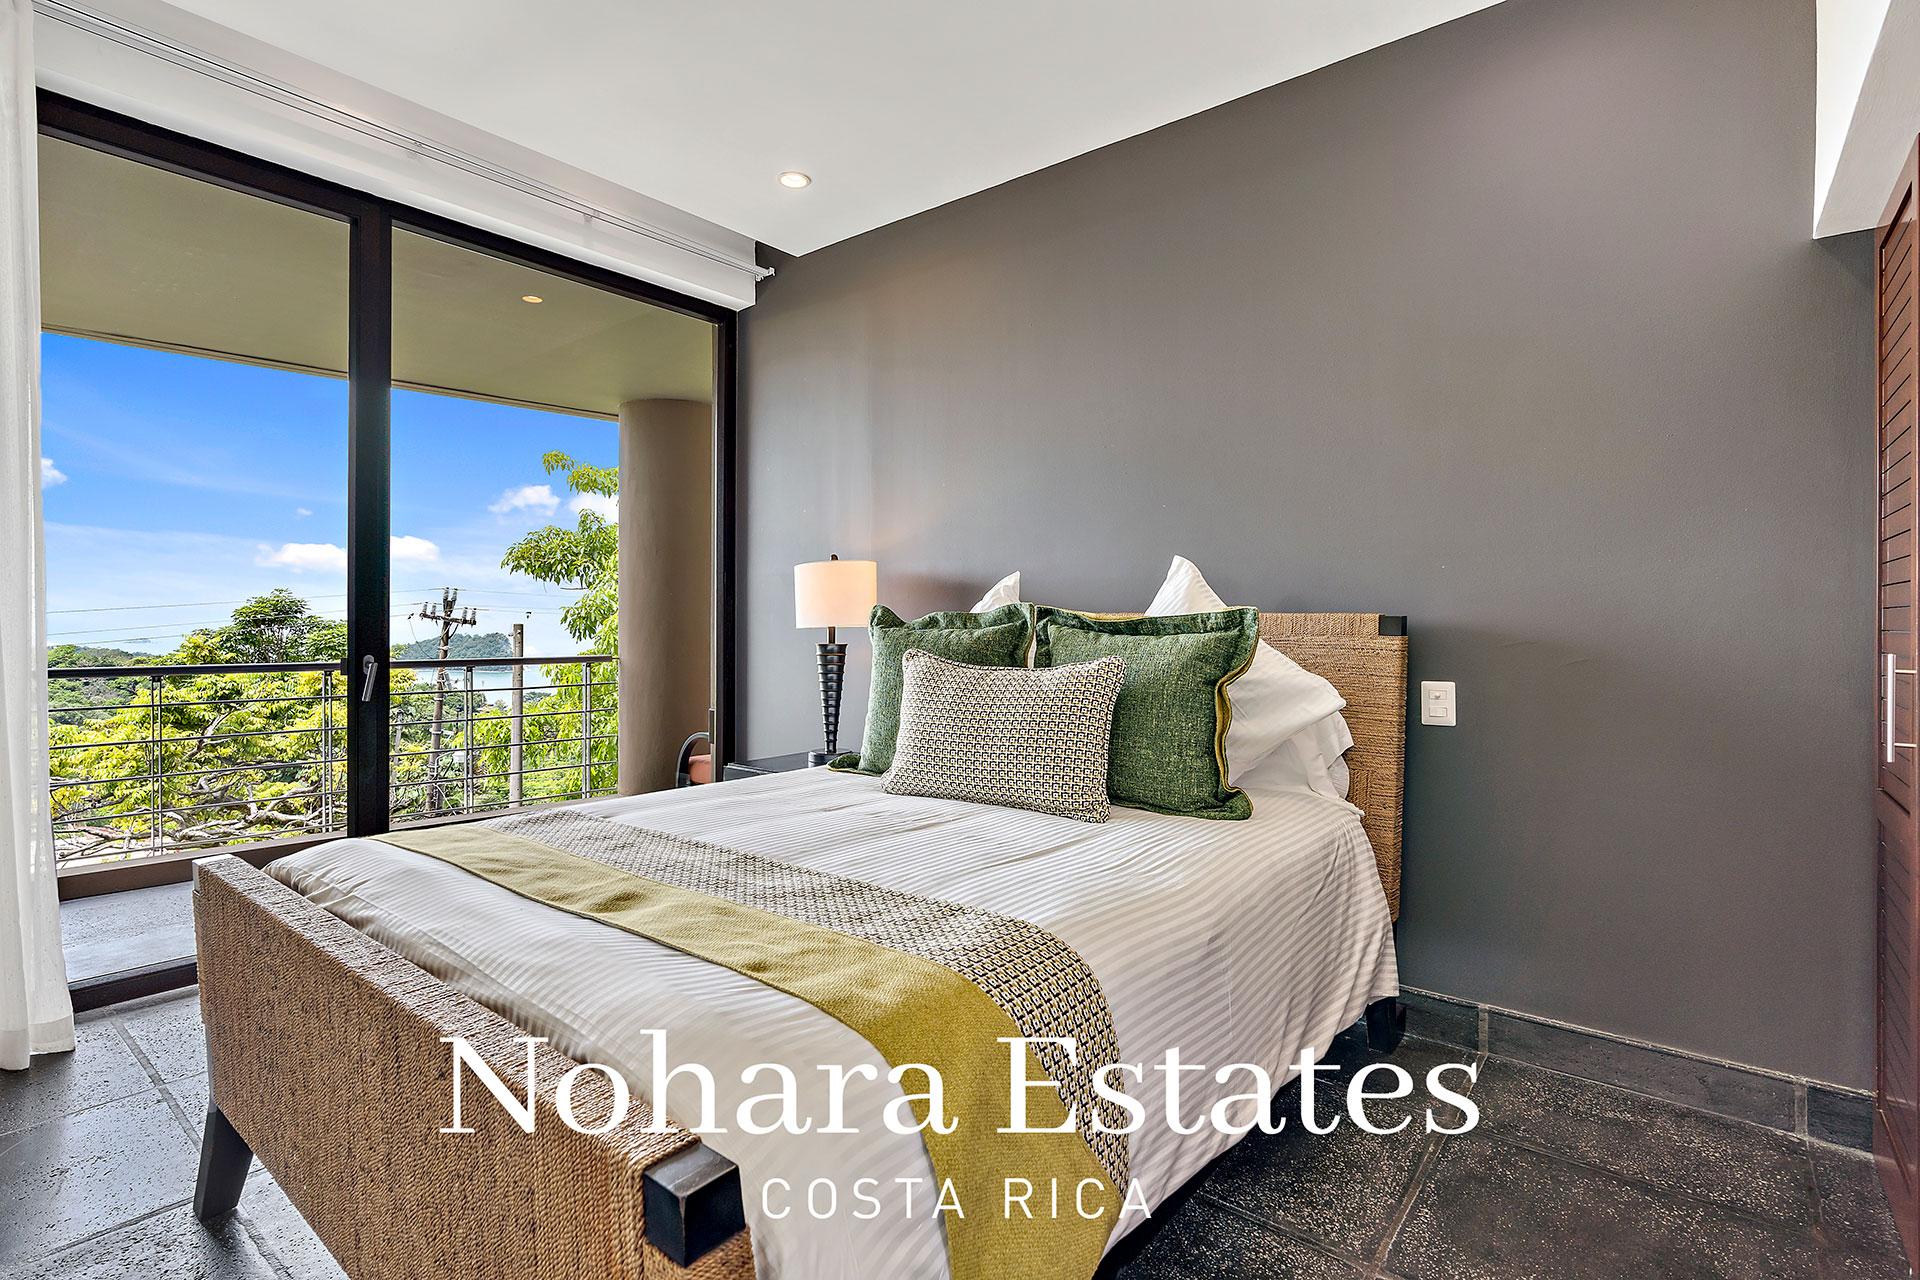 Nohara Estates Costa Rica 128 Penthouse Quepos Los Altos 16